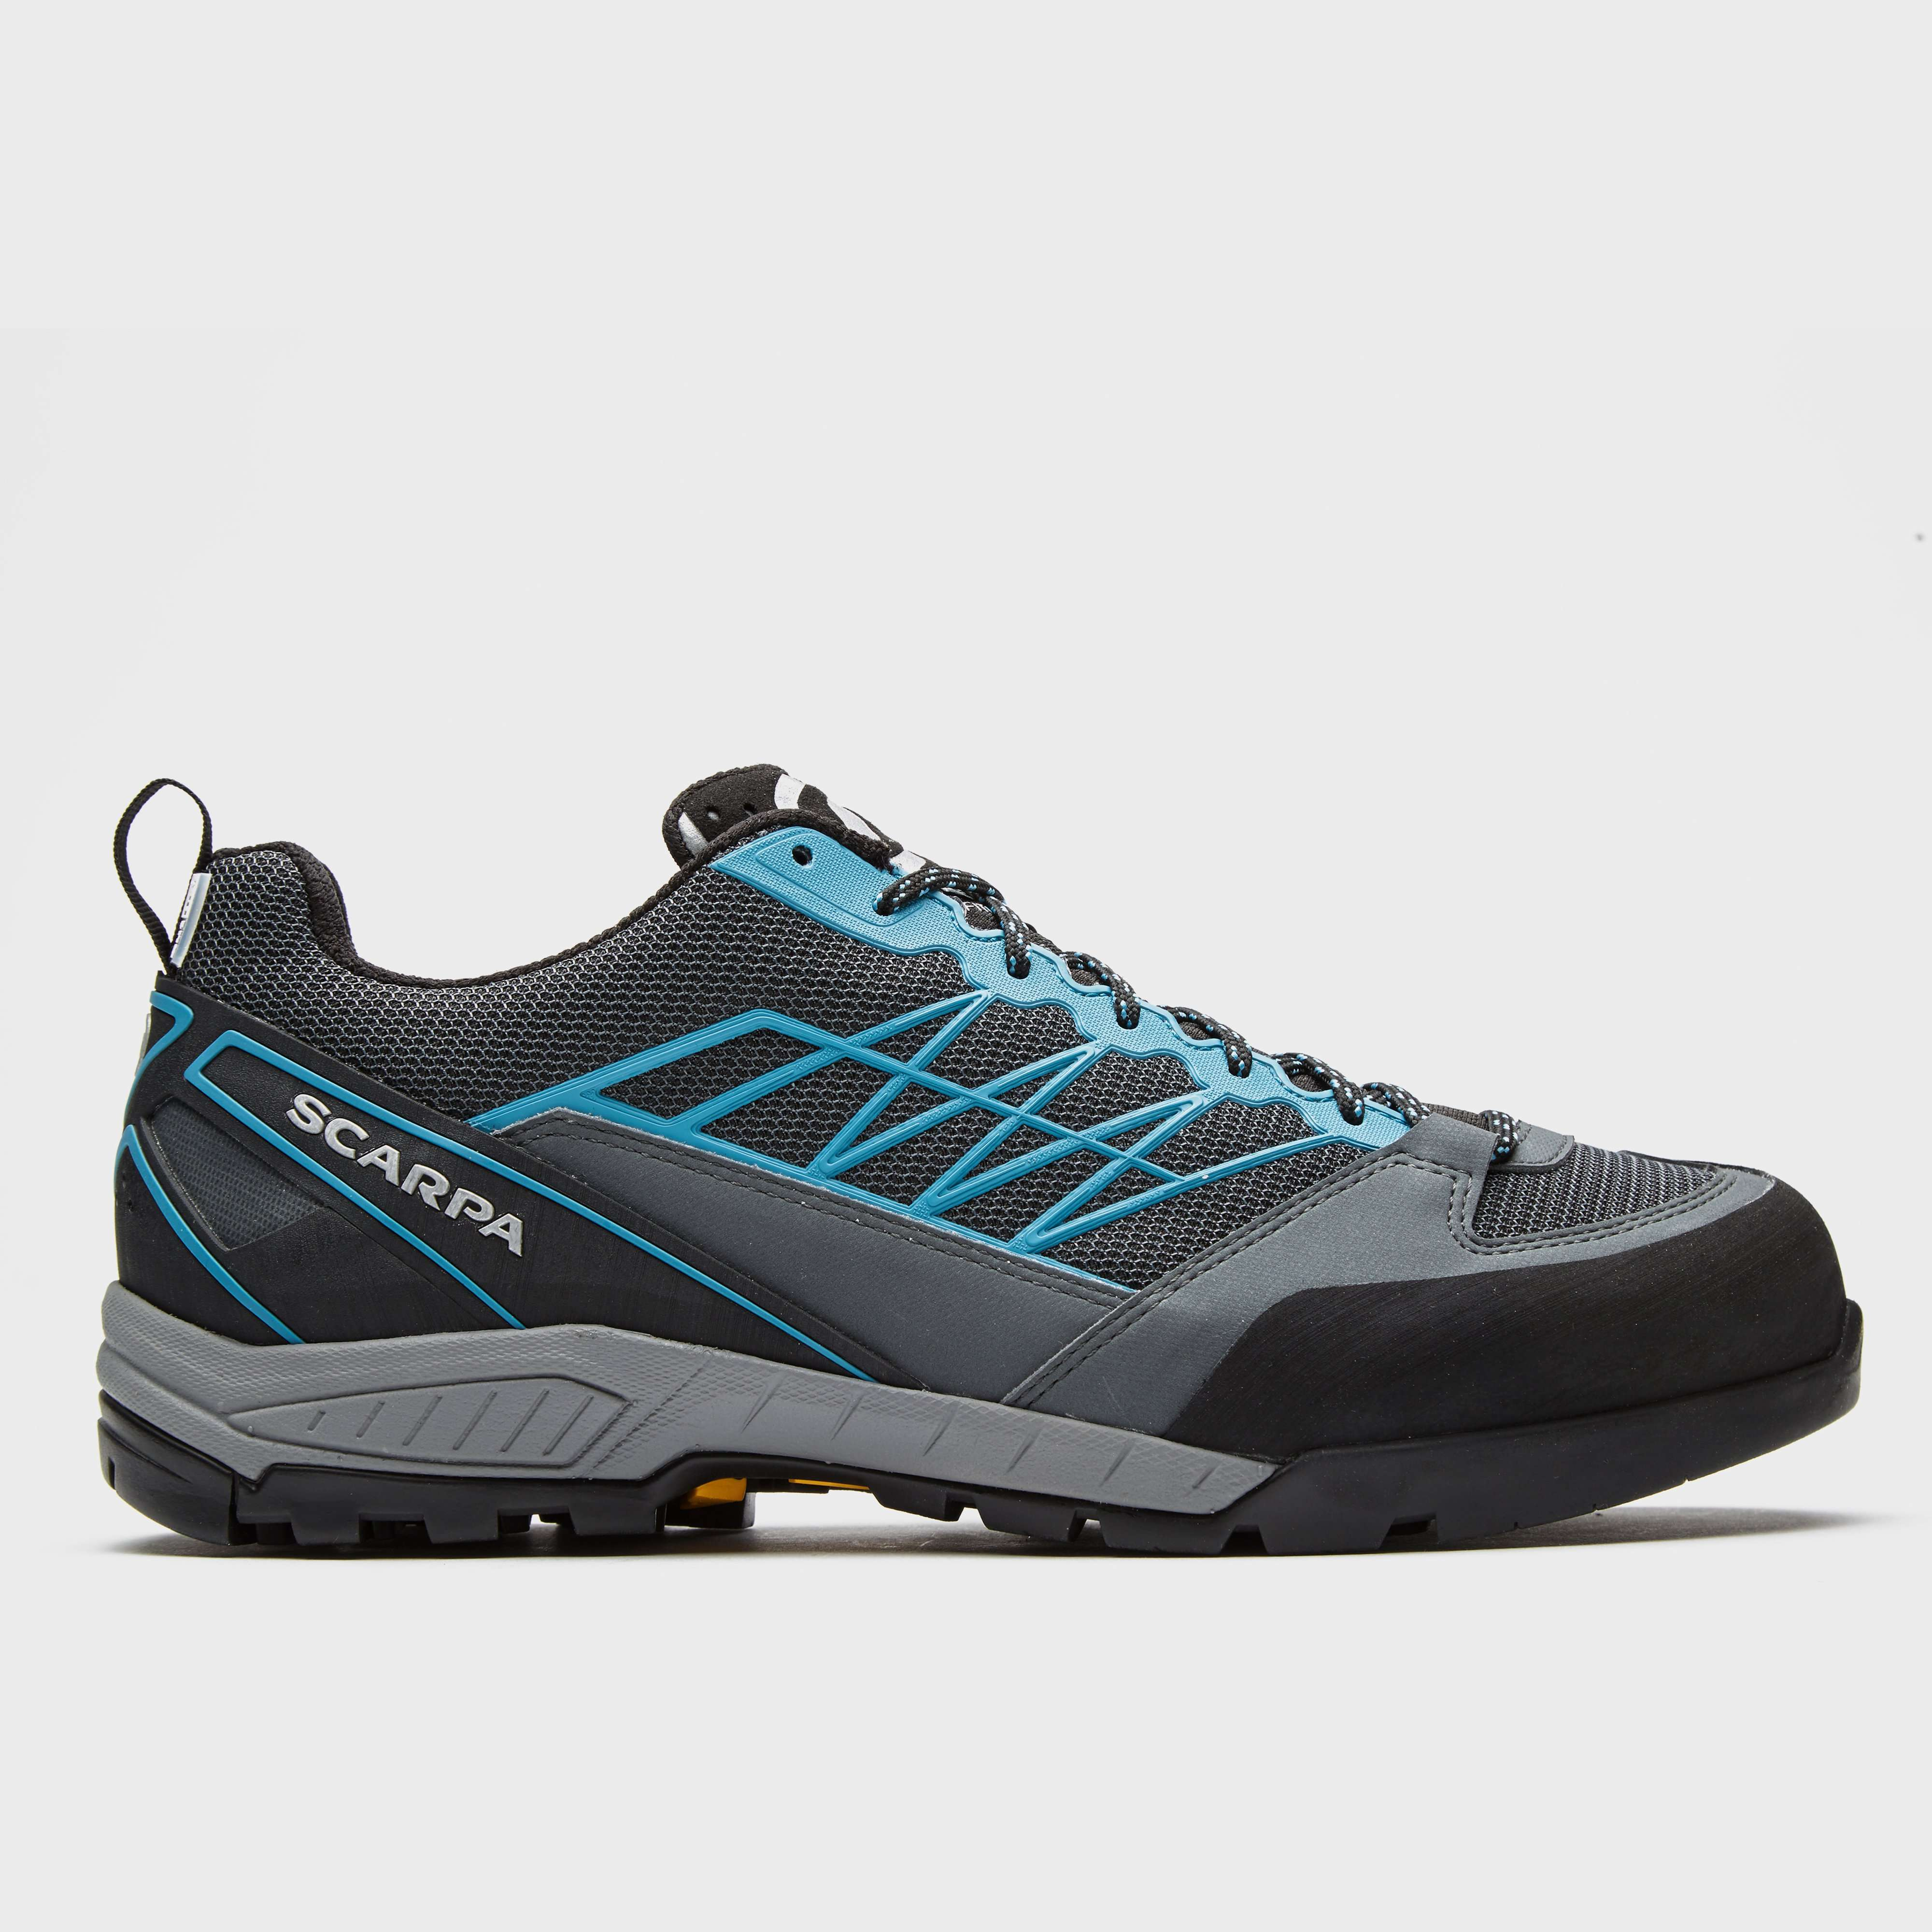 SCARPA Men's Epic Lite Approach Shoe